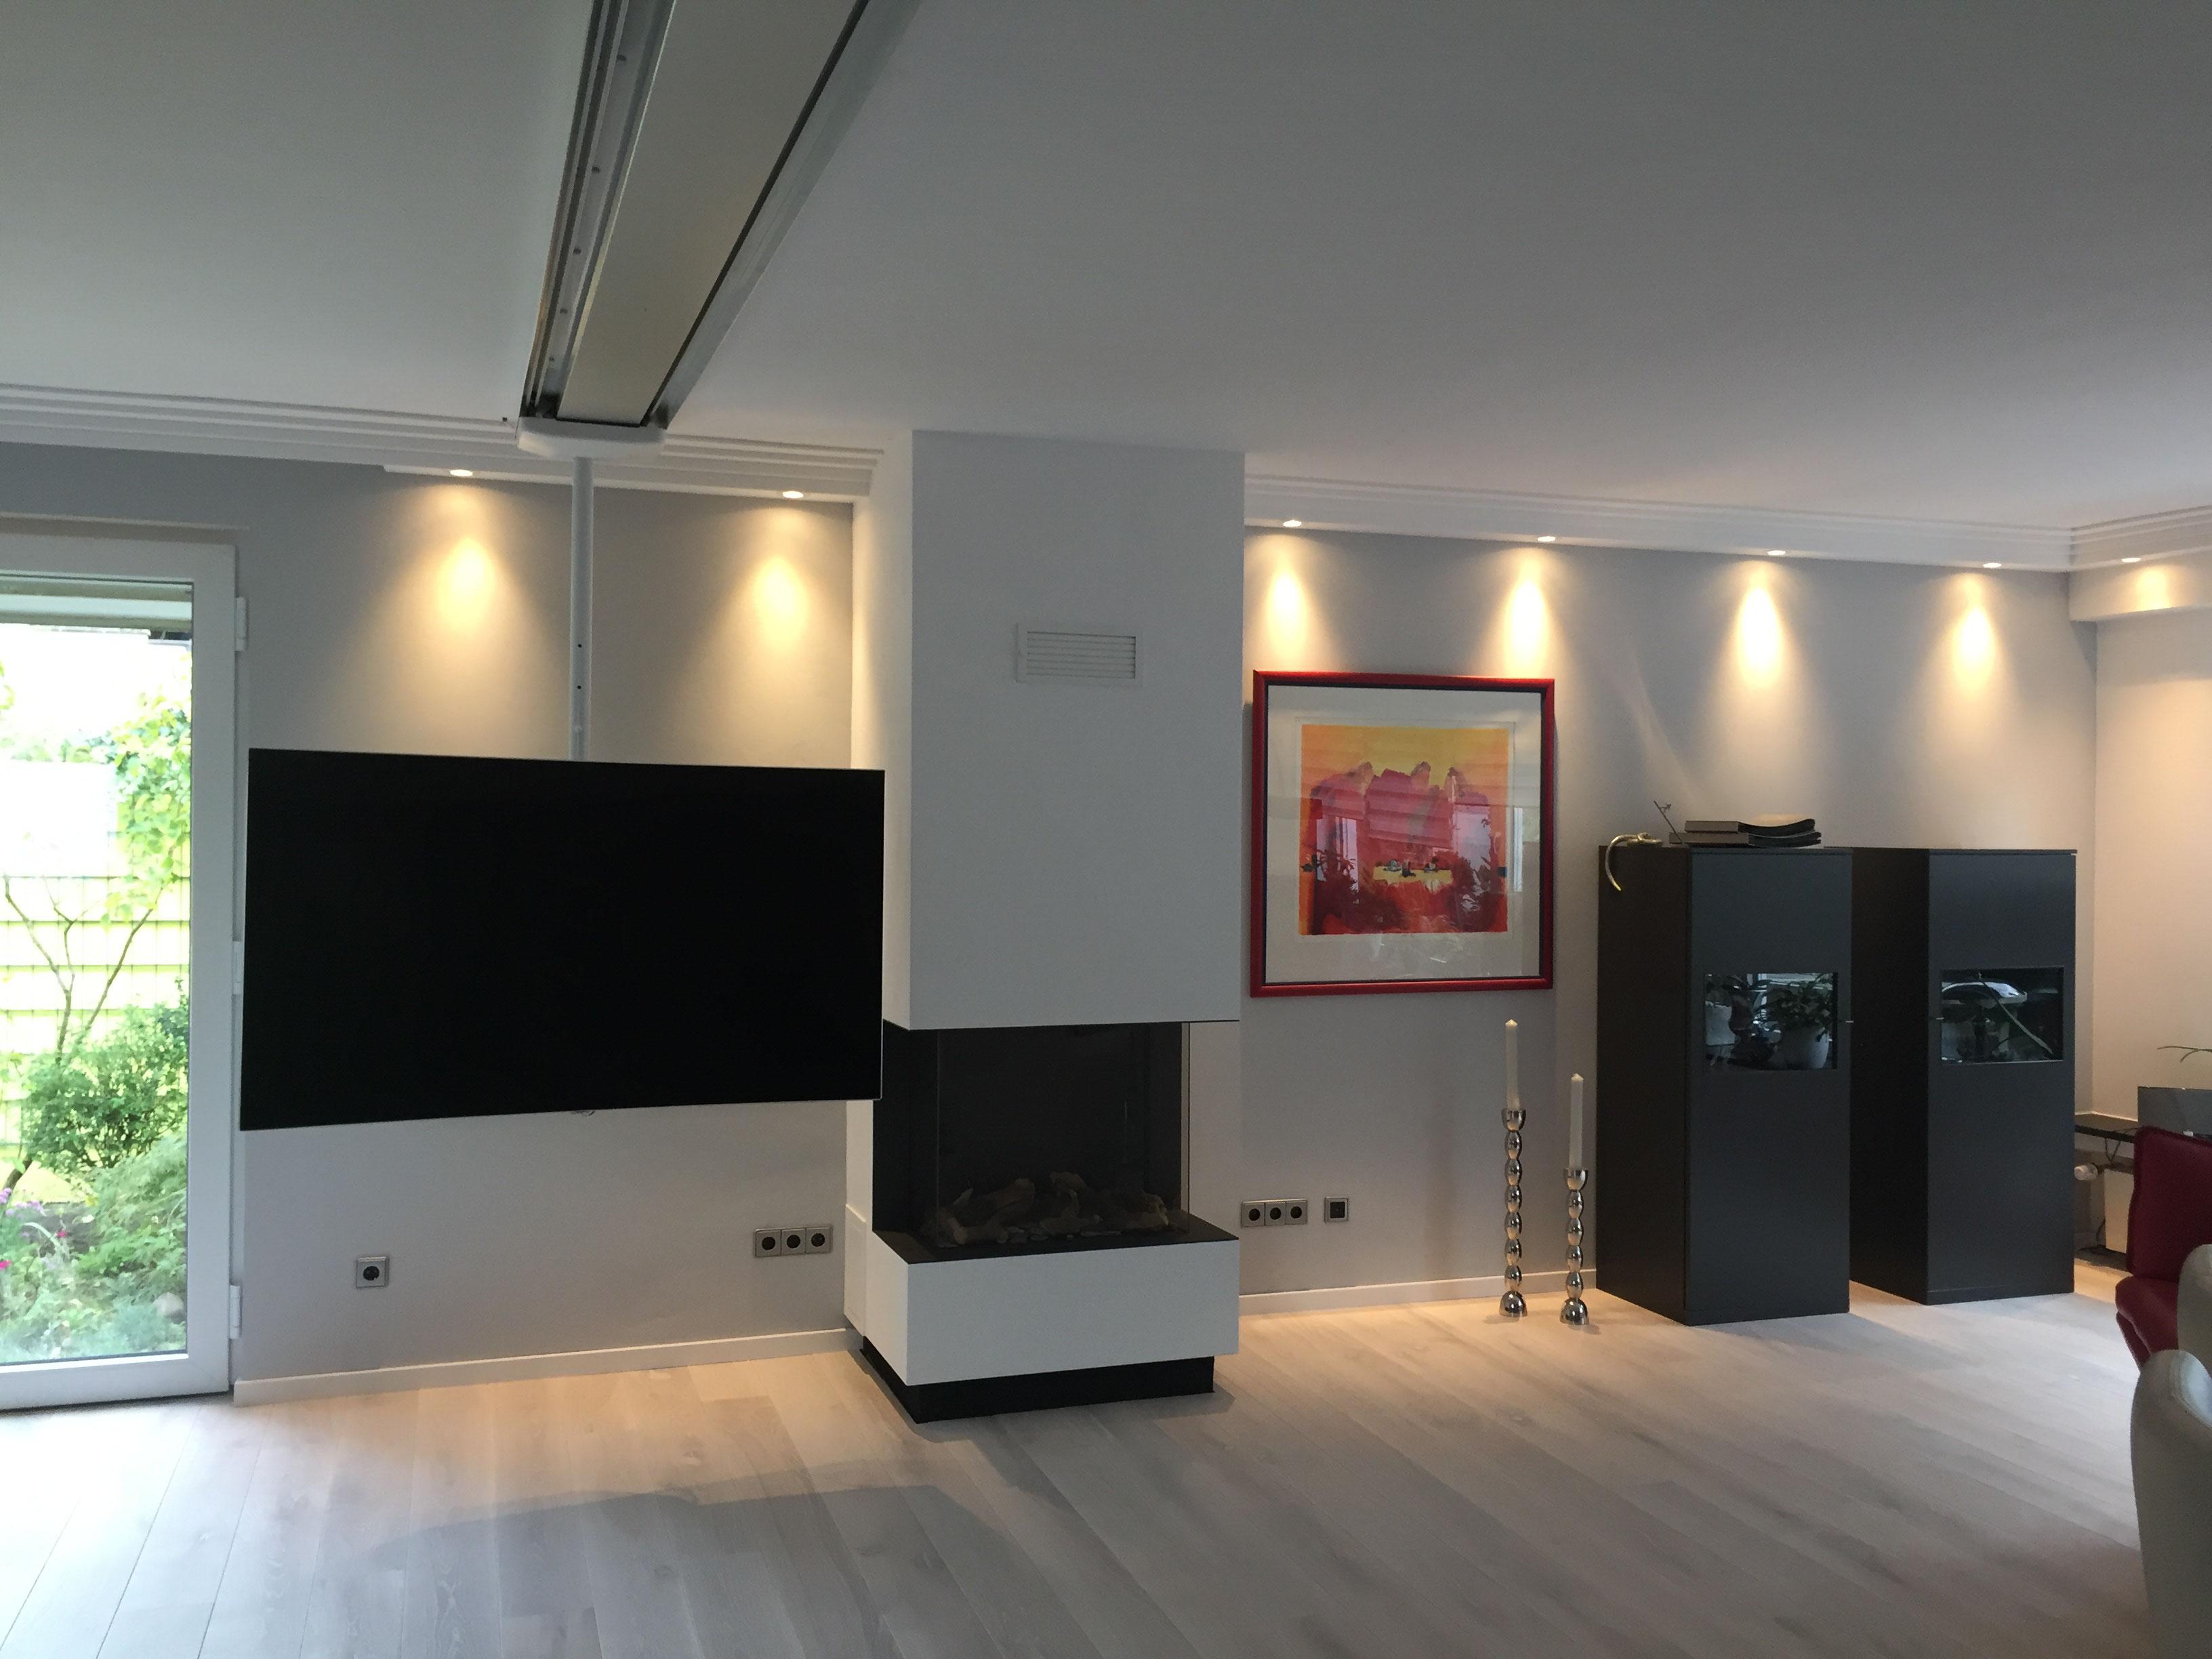 tv deckenhalterung screentrain neue kundenphotos screentrain. Black Bedroom Furniture Sets. Home Design Ideas